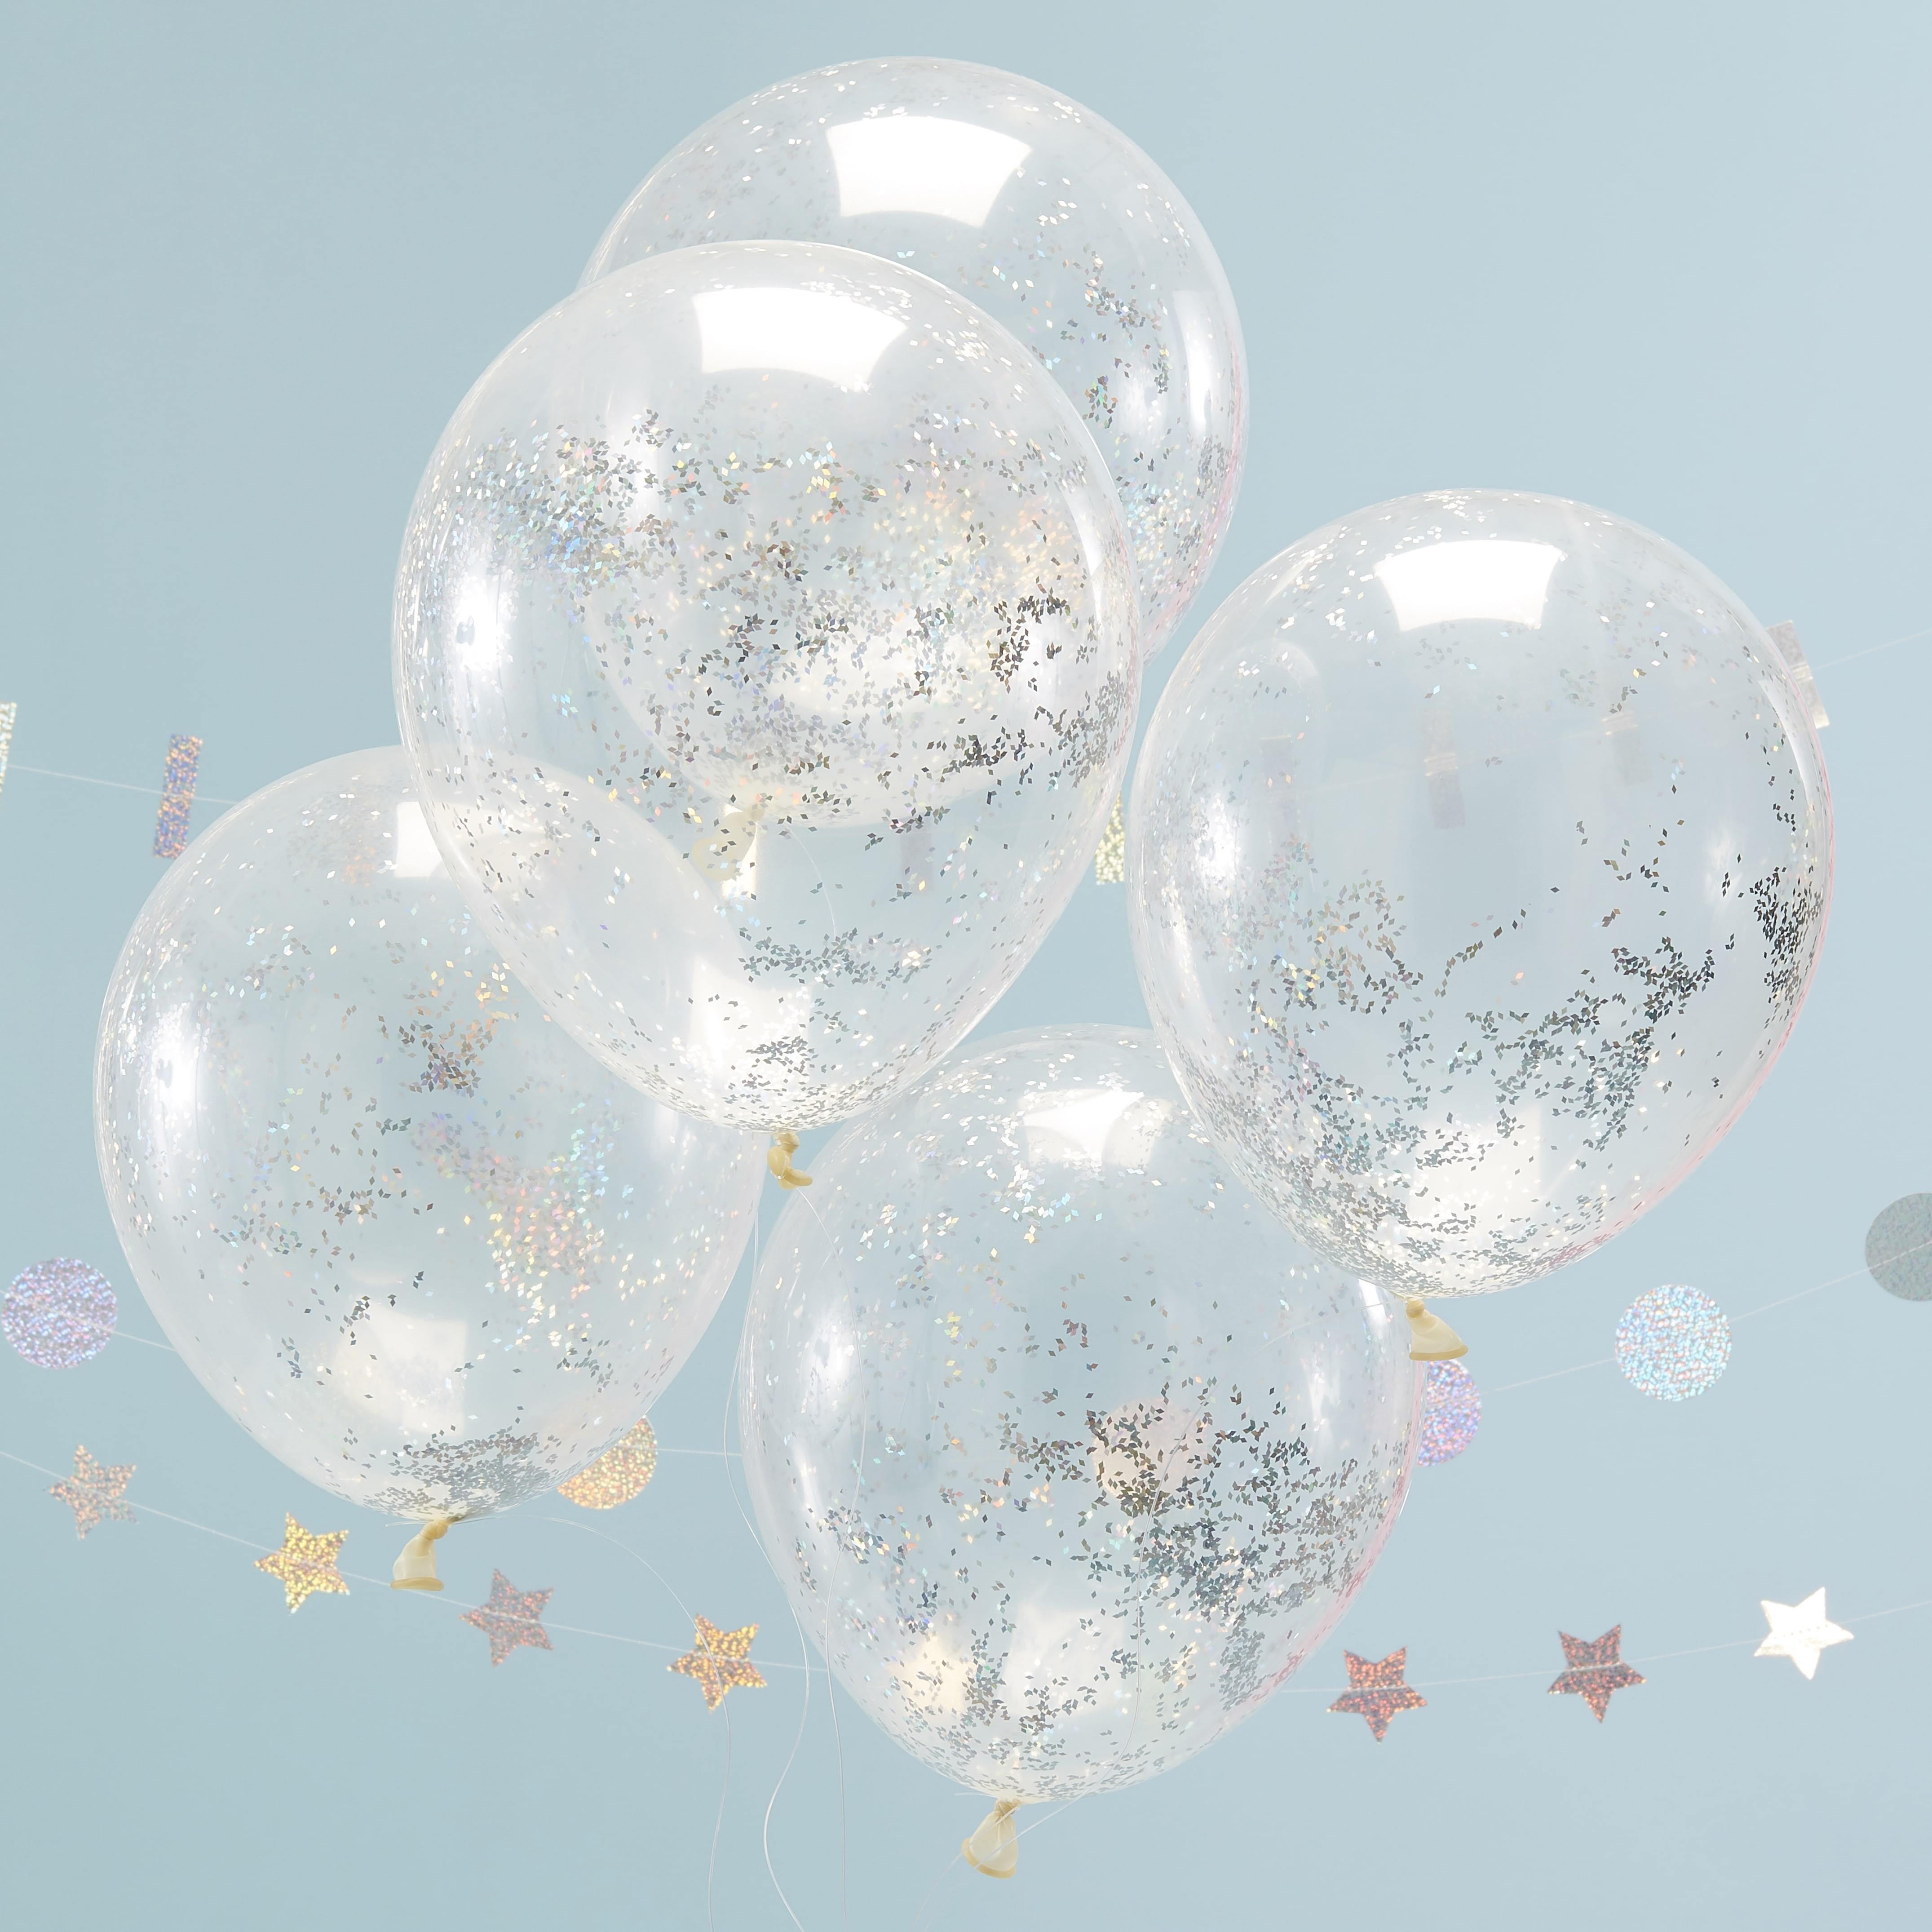 holographic glitter confetti balloons